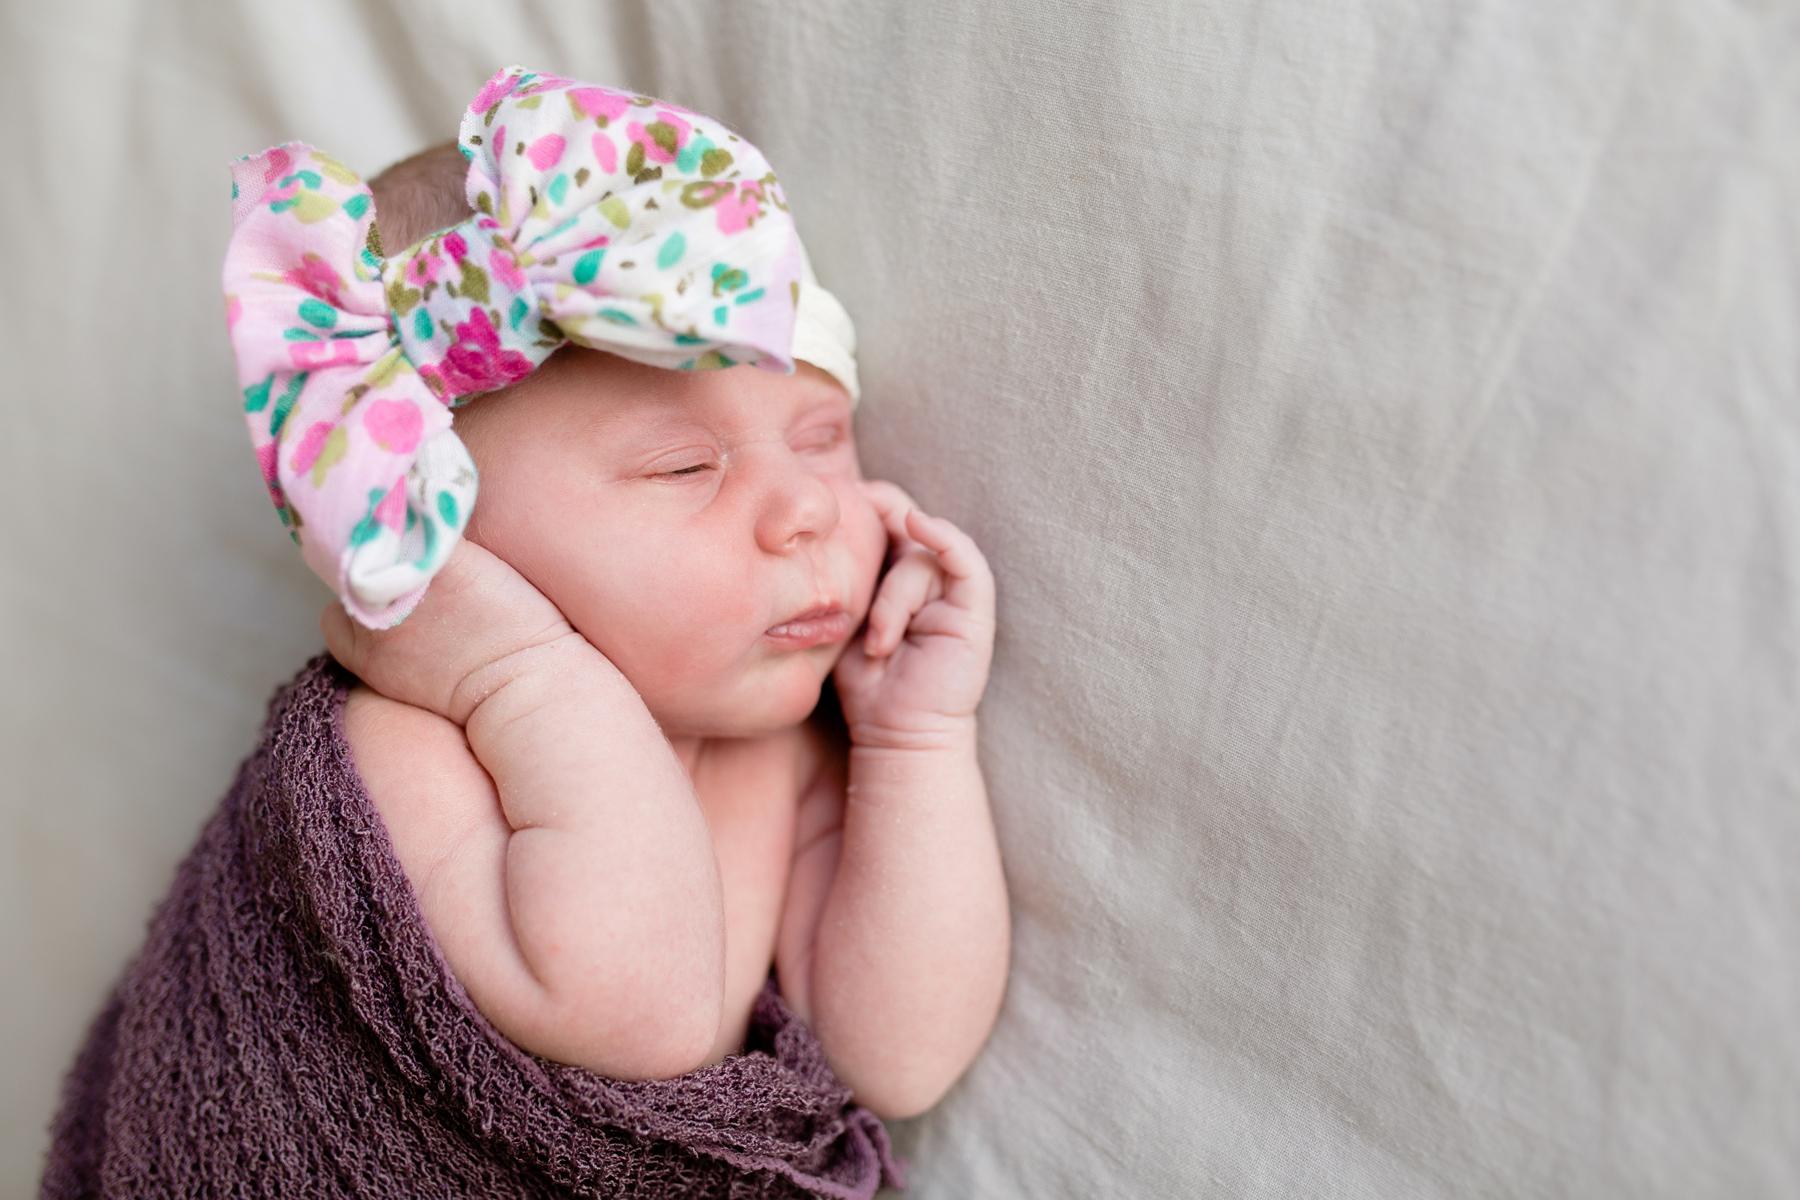 newborn_baby_girl_floral_bows_lifestyle_photographer_oklahoma.jpg